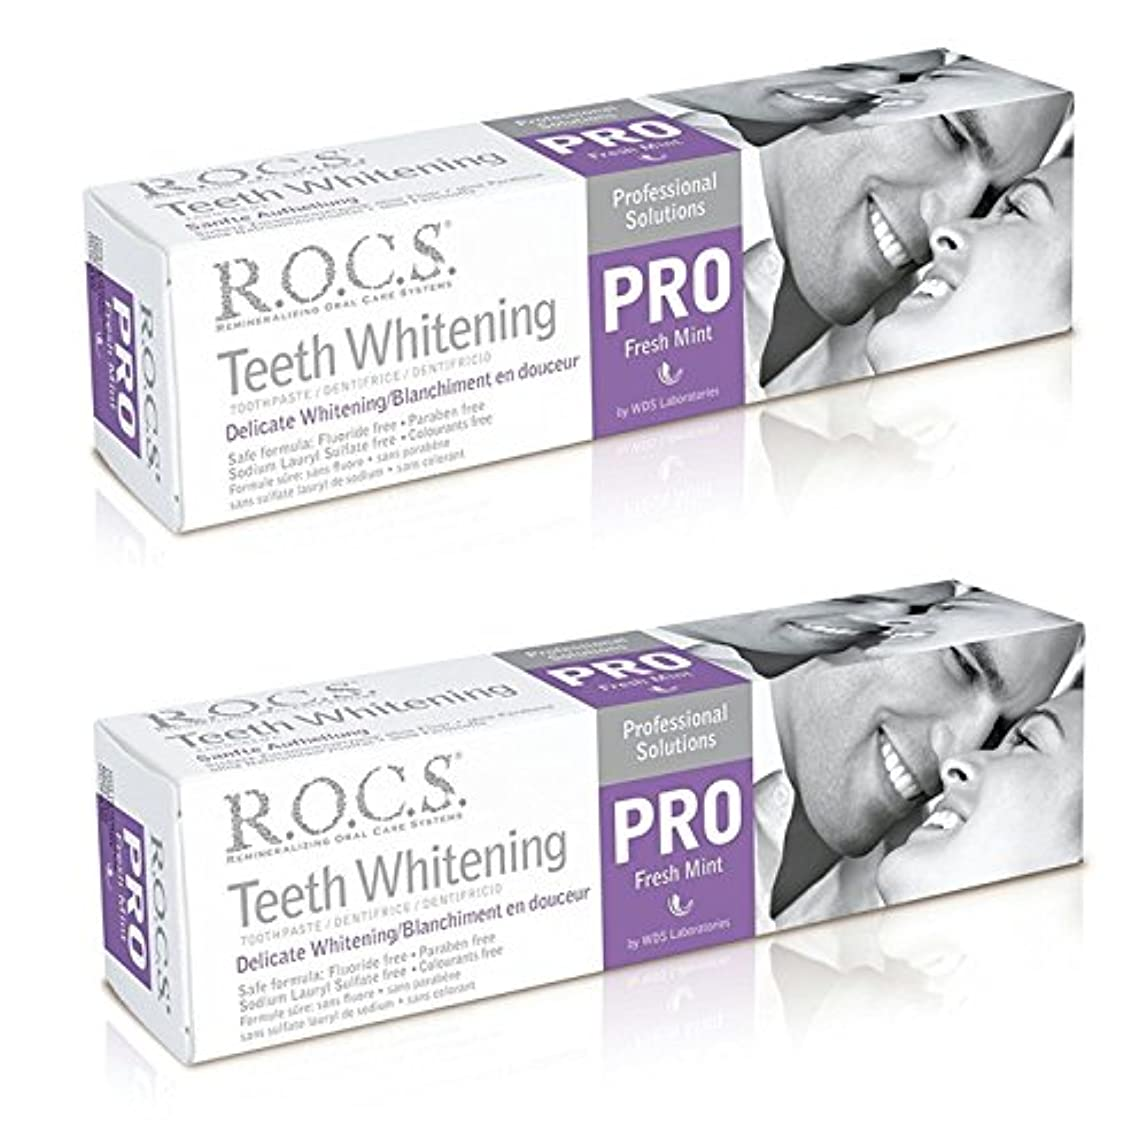 R.O.C.S.(ロックス) プロ デリケート ホワイトニング フレッシュミント (2箱セット)